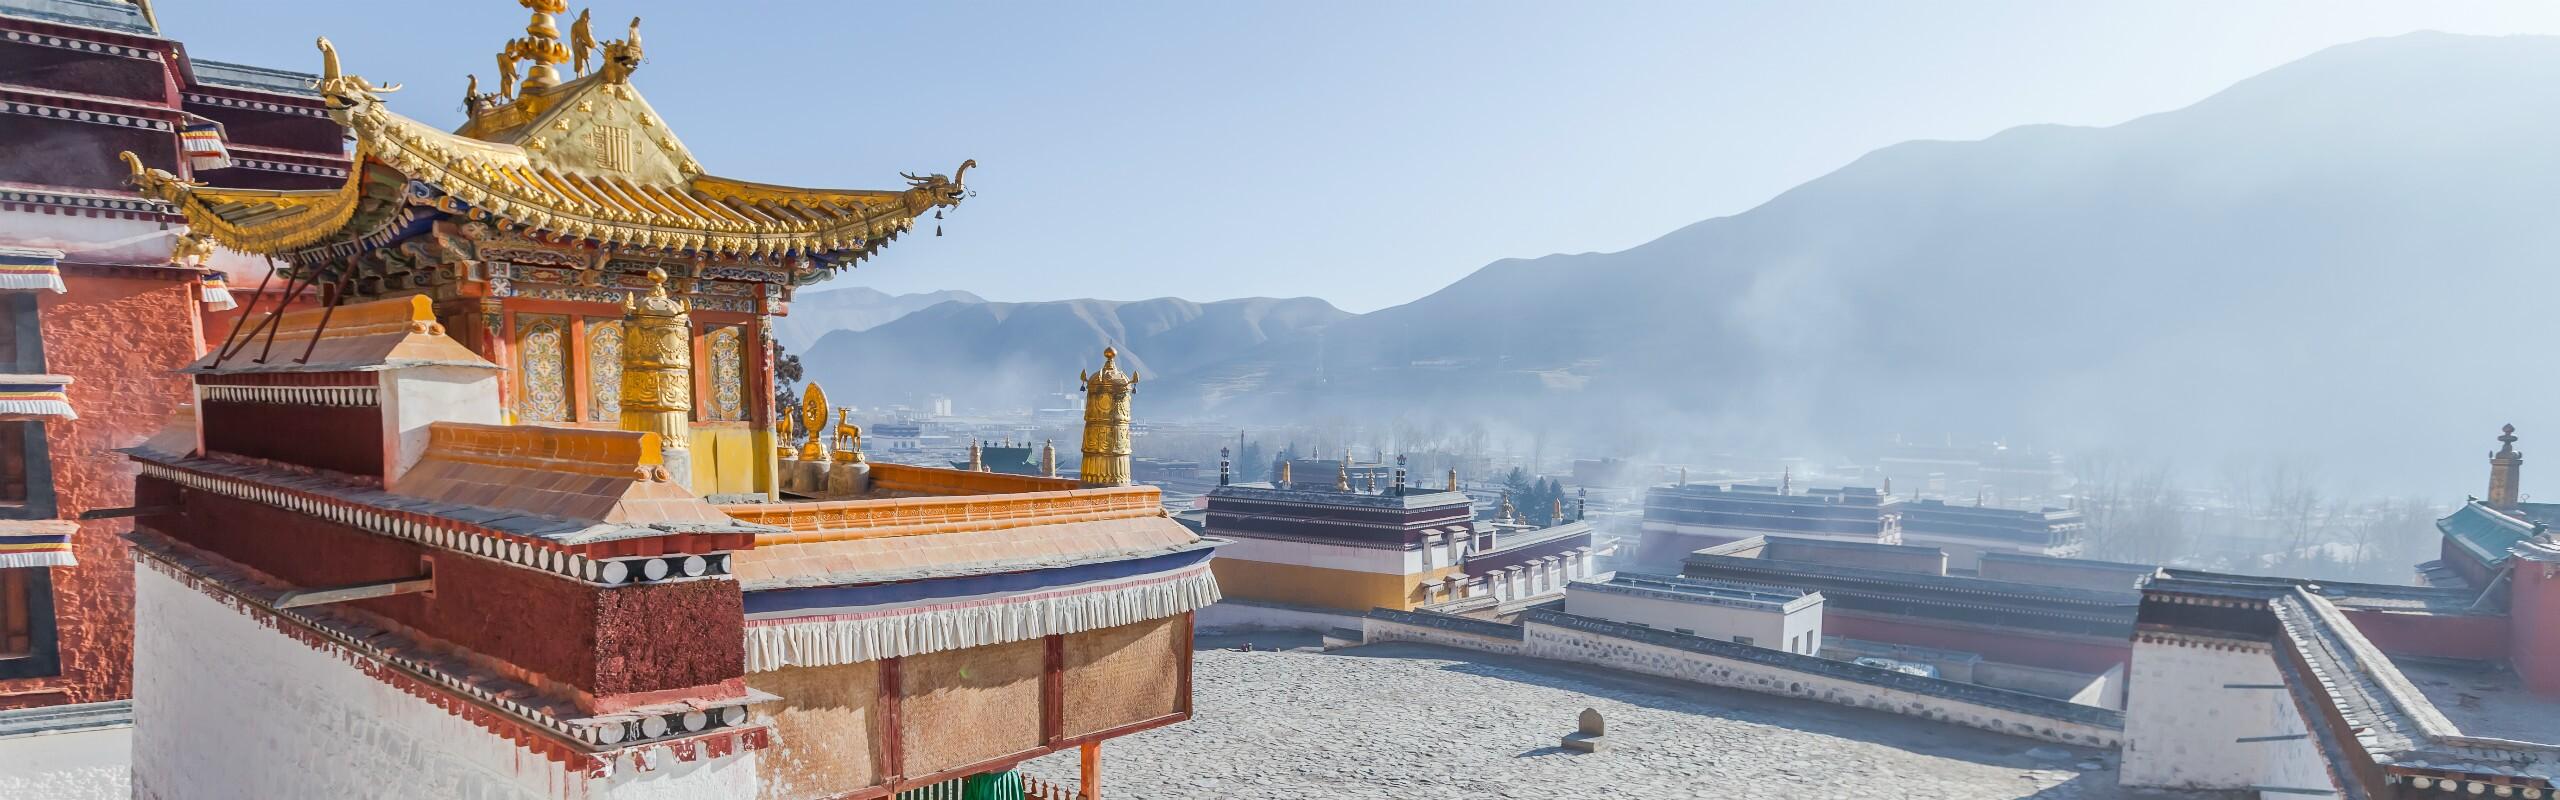 6 Days Xiahe, Langmusi and Zhagana Tour